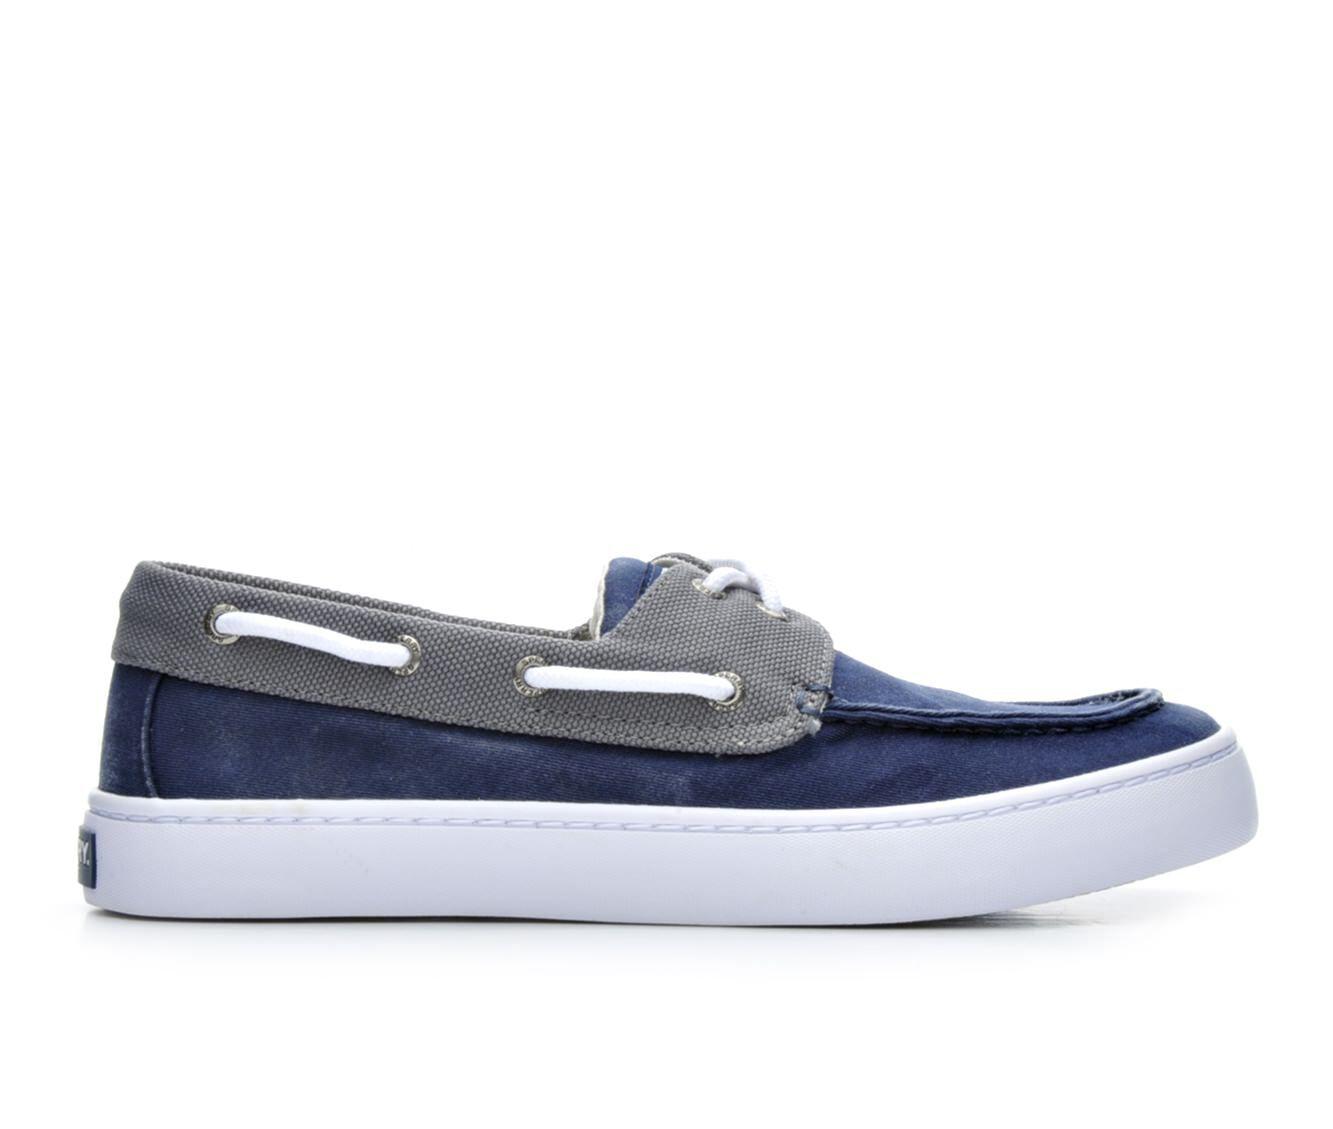 Men's Sperry Cutter 2 Eye Boat Shoes popular online tIRBZ